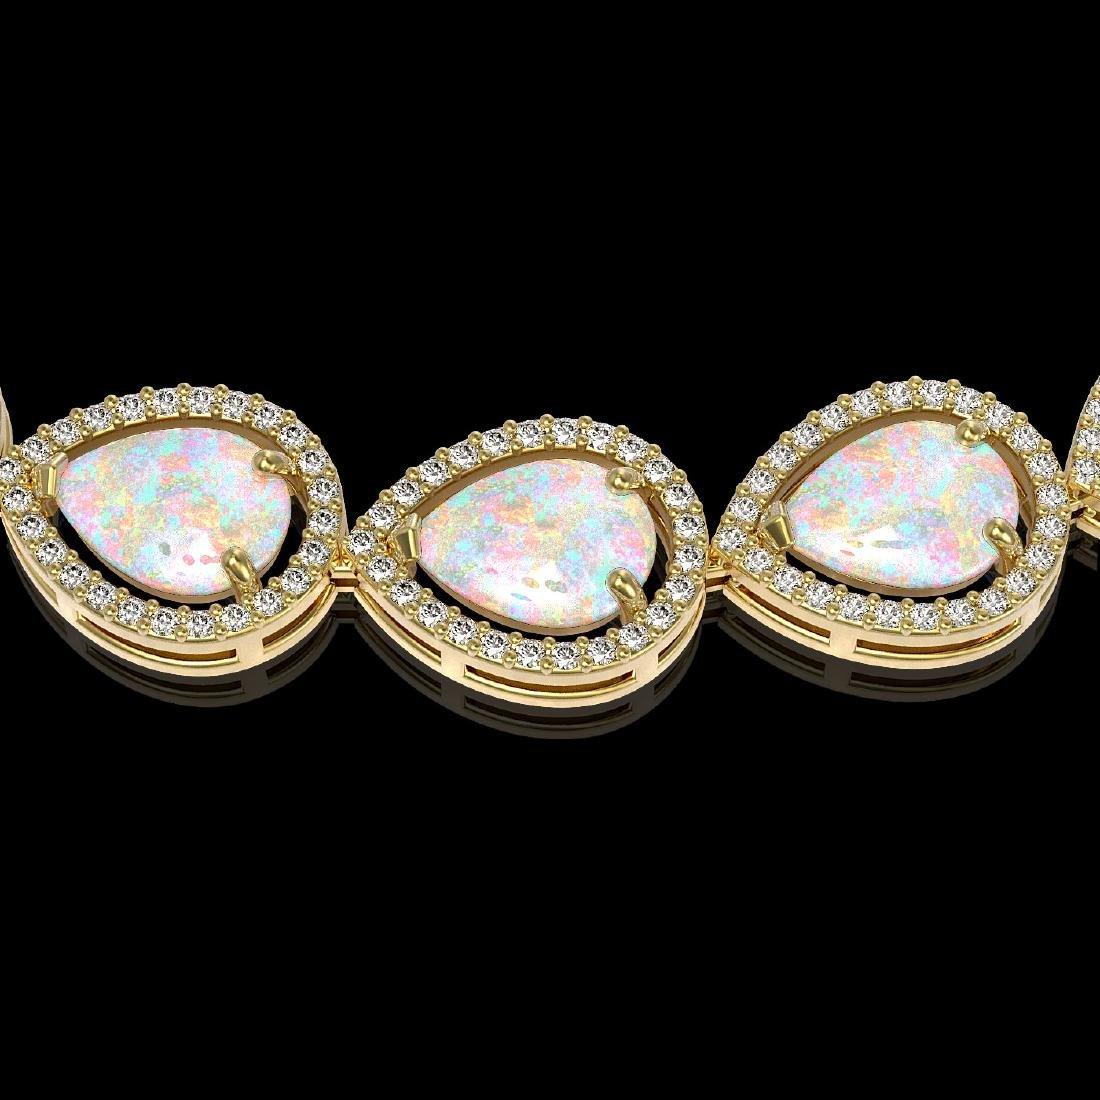 36.48 CTW Opal & Diamond Halo Necklace 10K Yellow Gold - 3